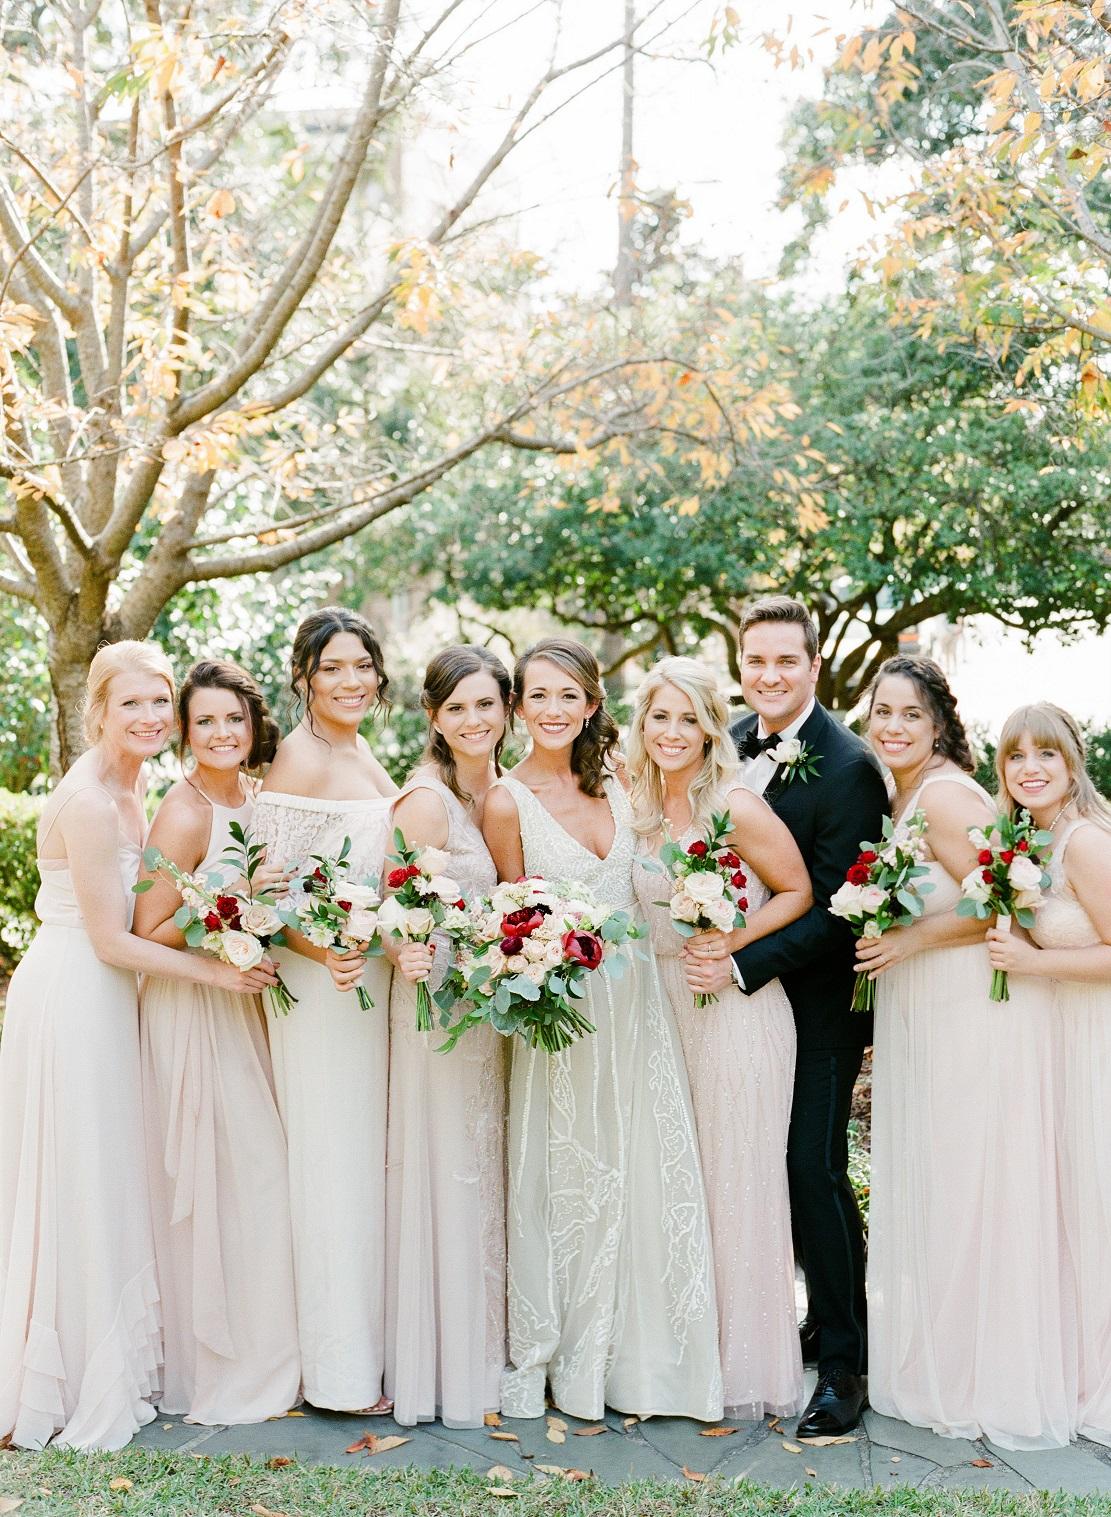 d05897236338 blogs — Blog — A Lowcountry Wedding Blog & Magazine - Charleston ...